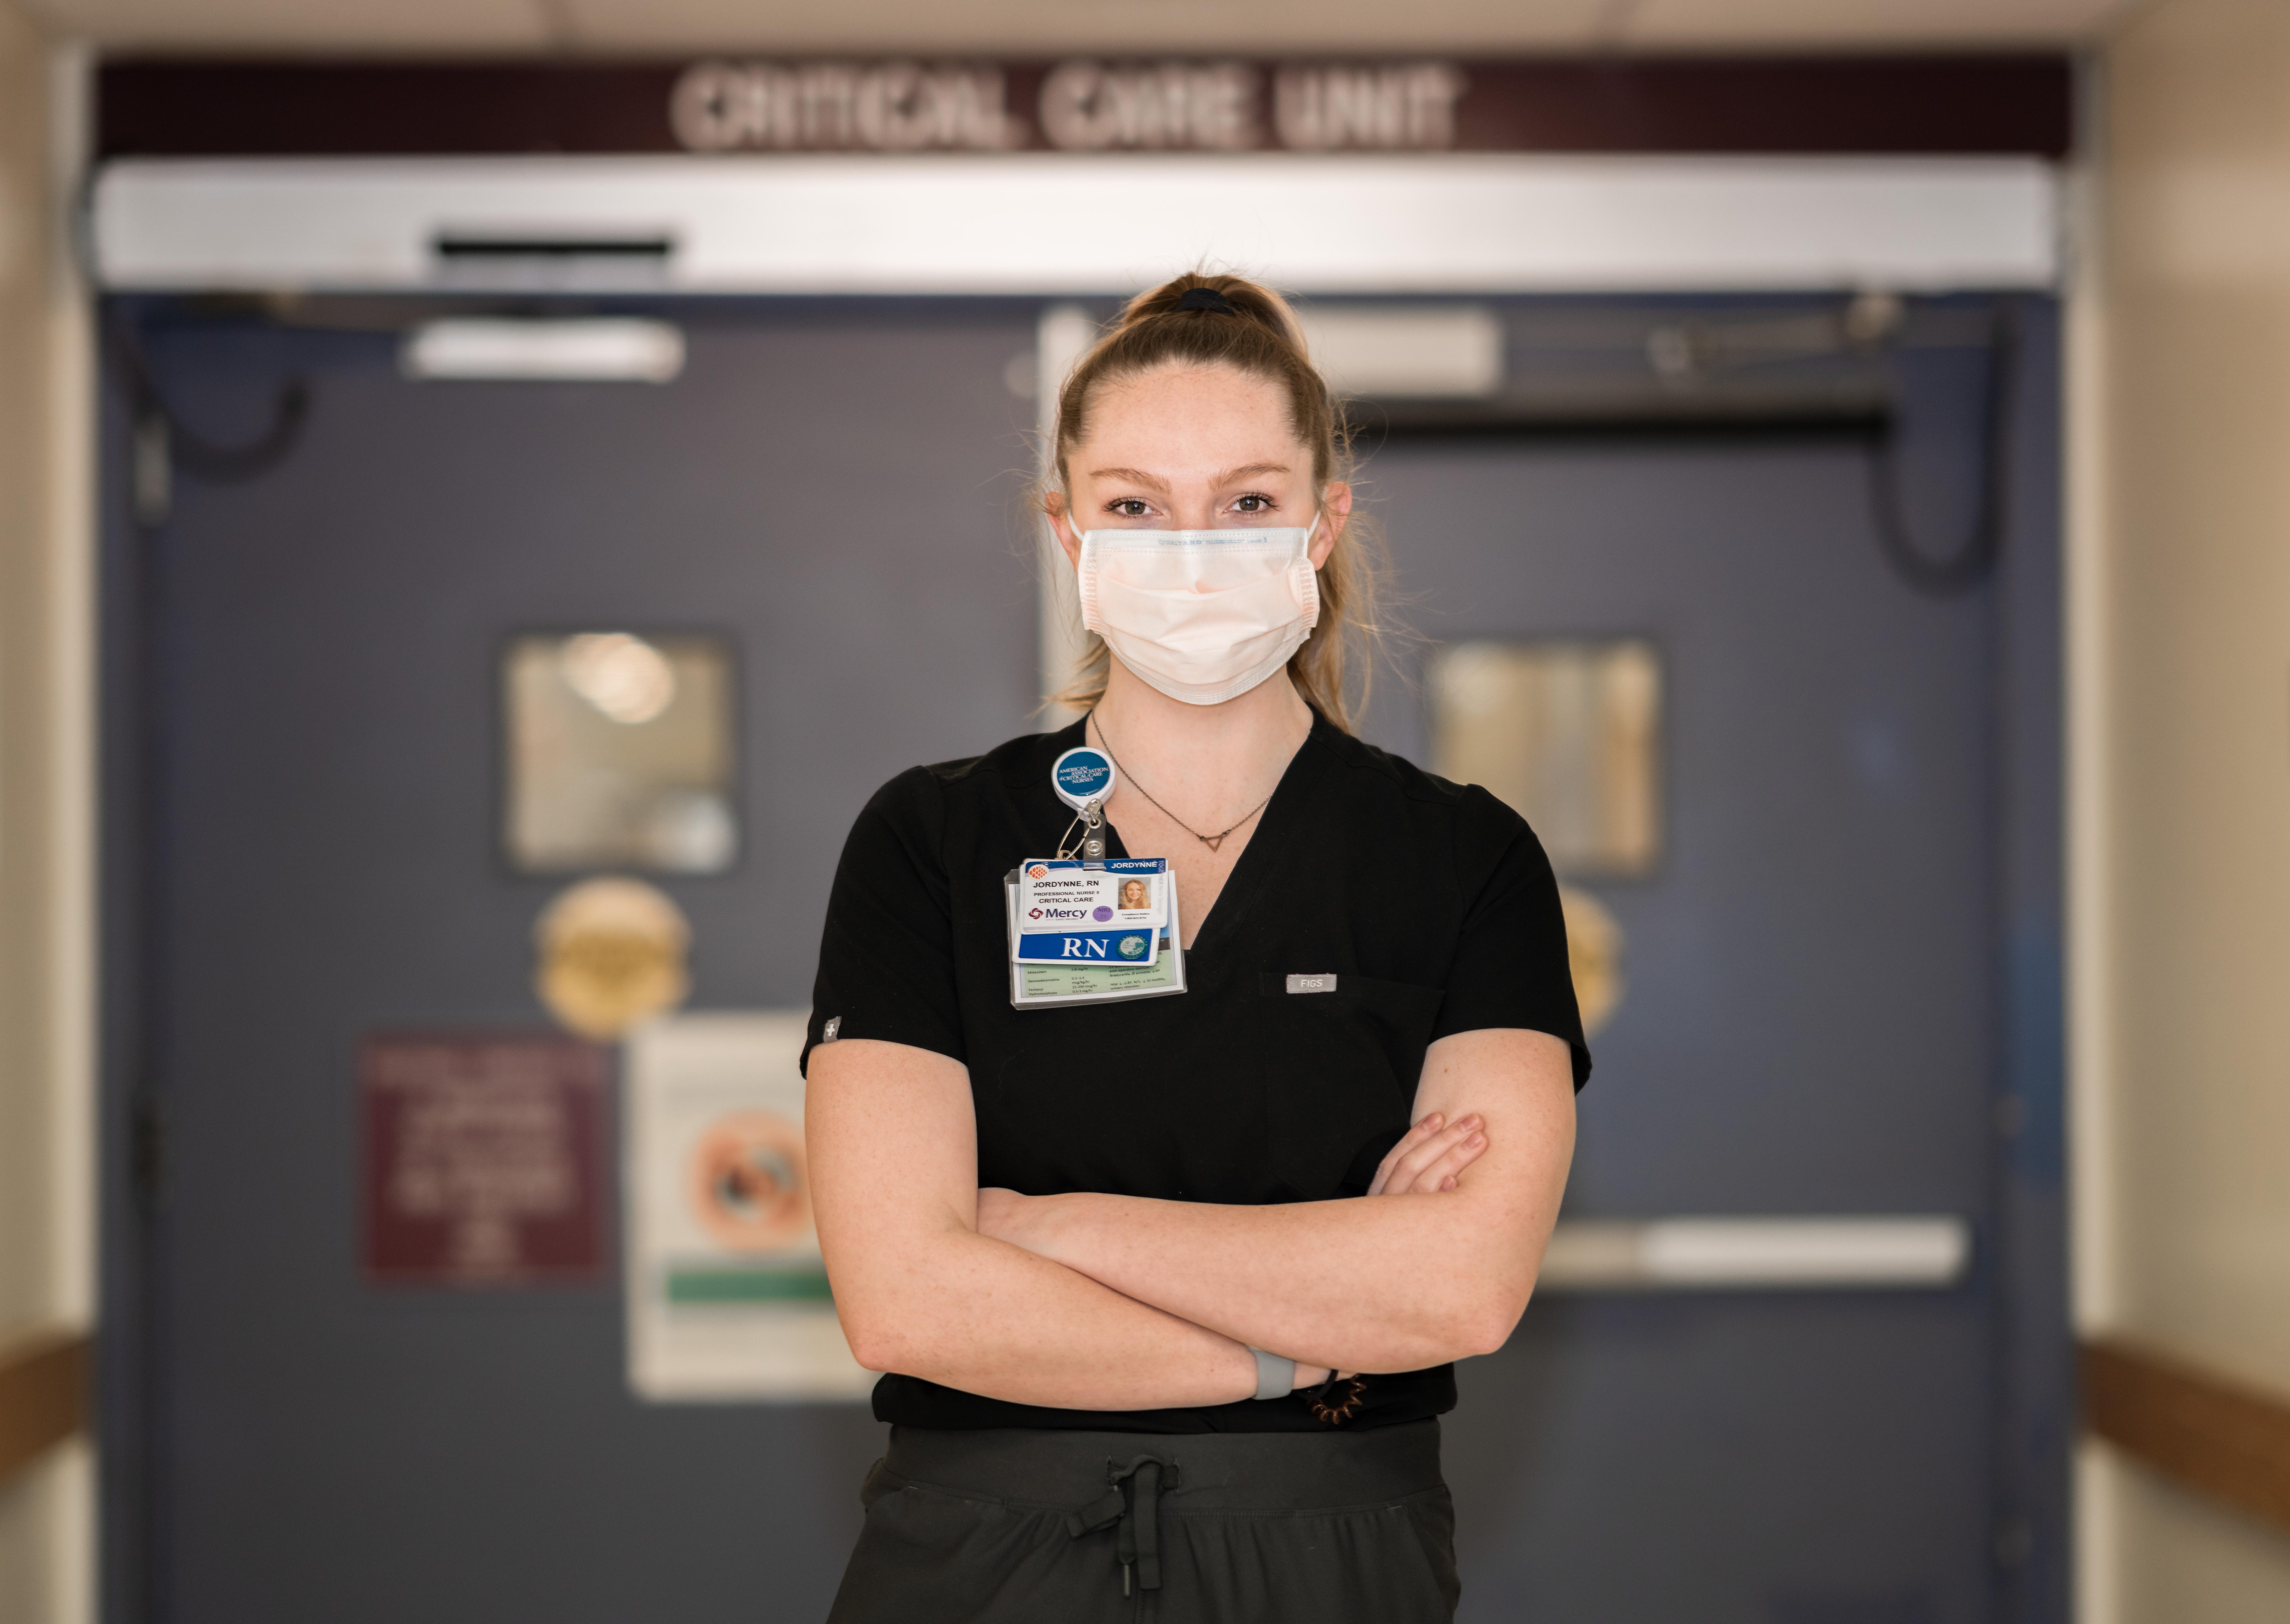 West End News - Jordynne Copp - Northern Light Mercy ICU